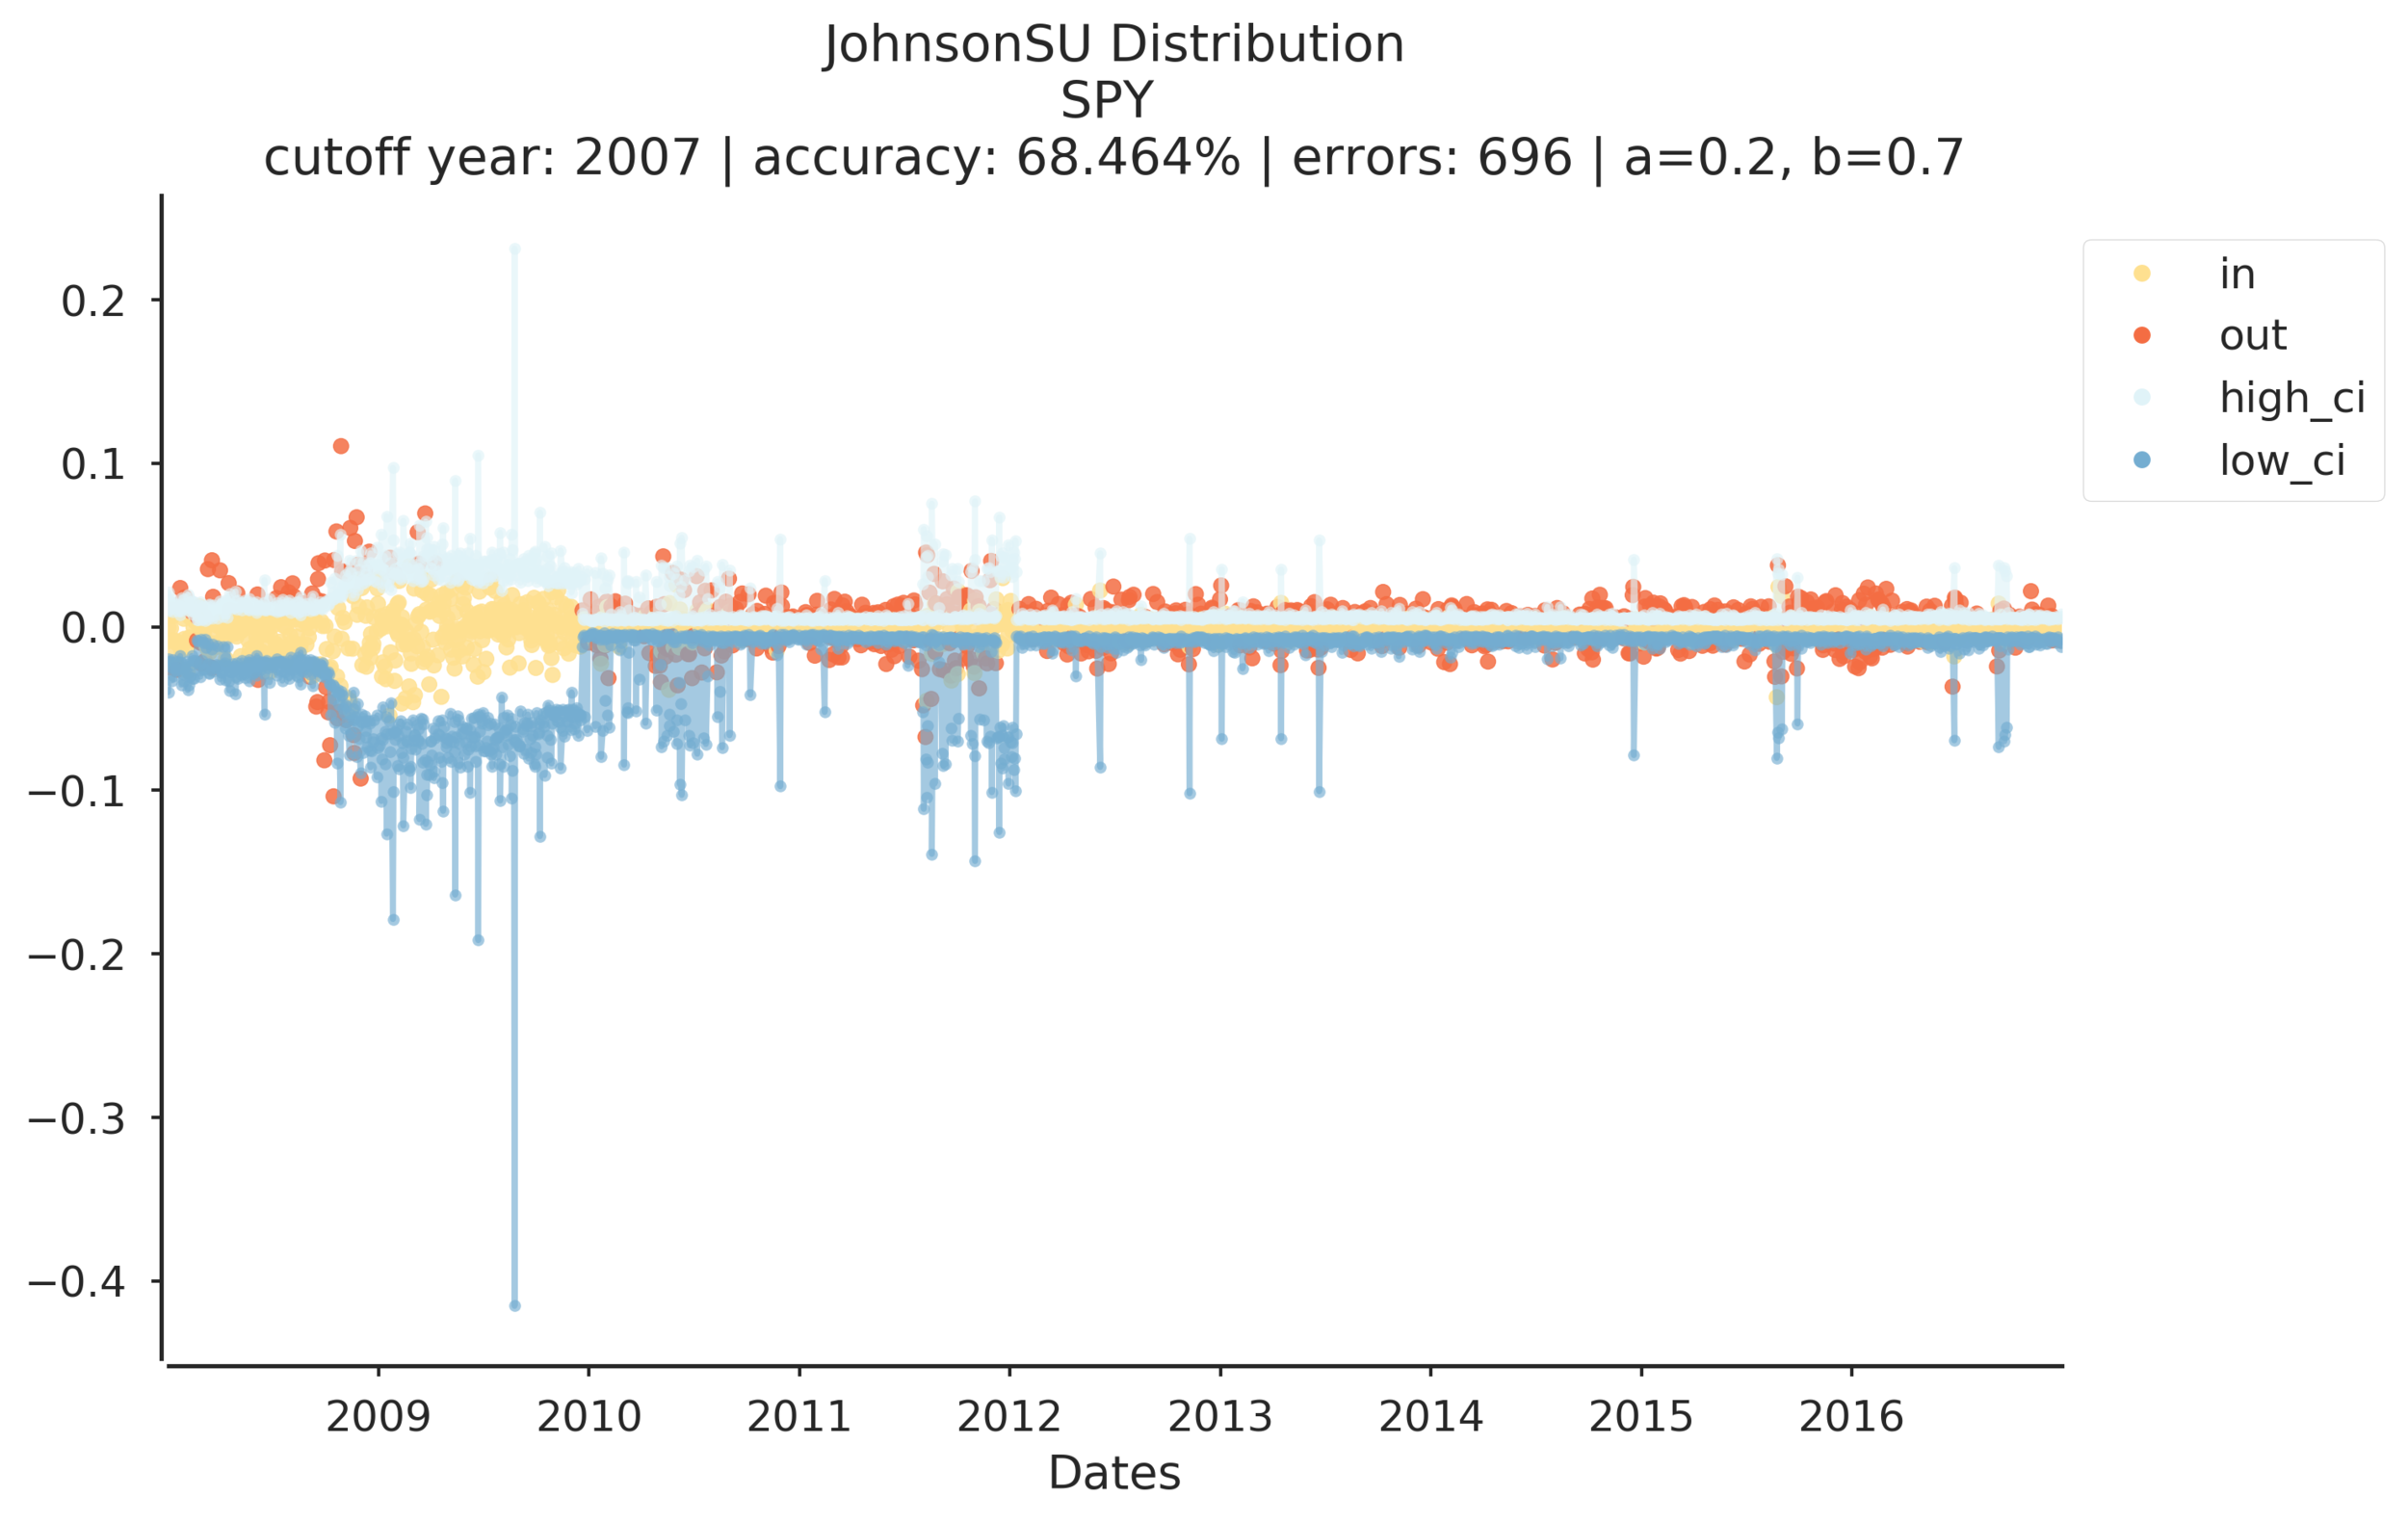 JohnsonSU Distribution-SPY prediction success 2017-04-15 13:55:25.586094.png